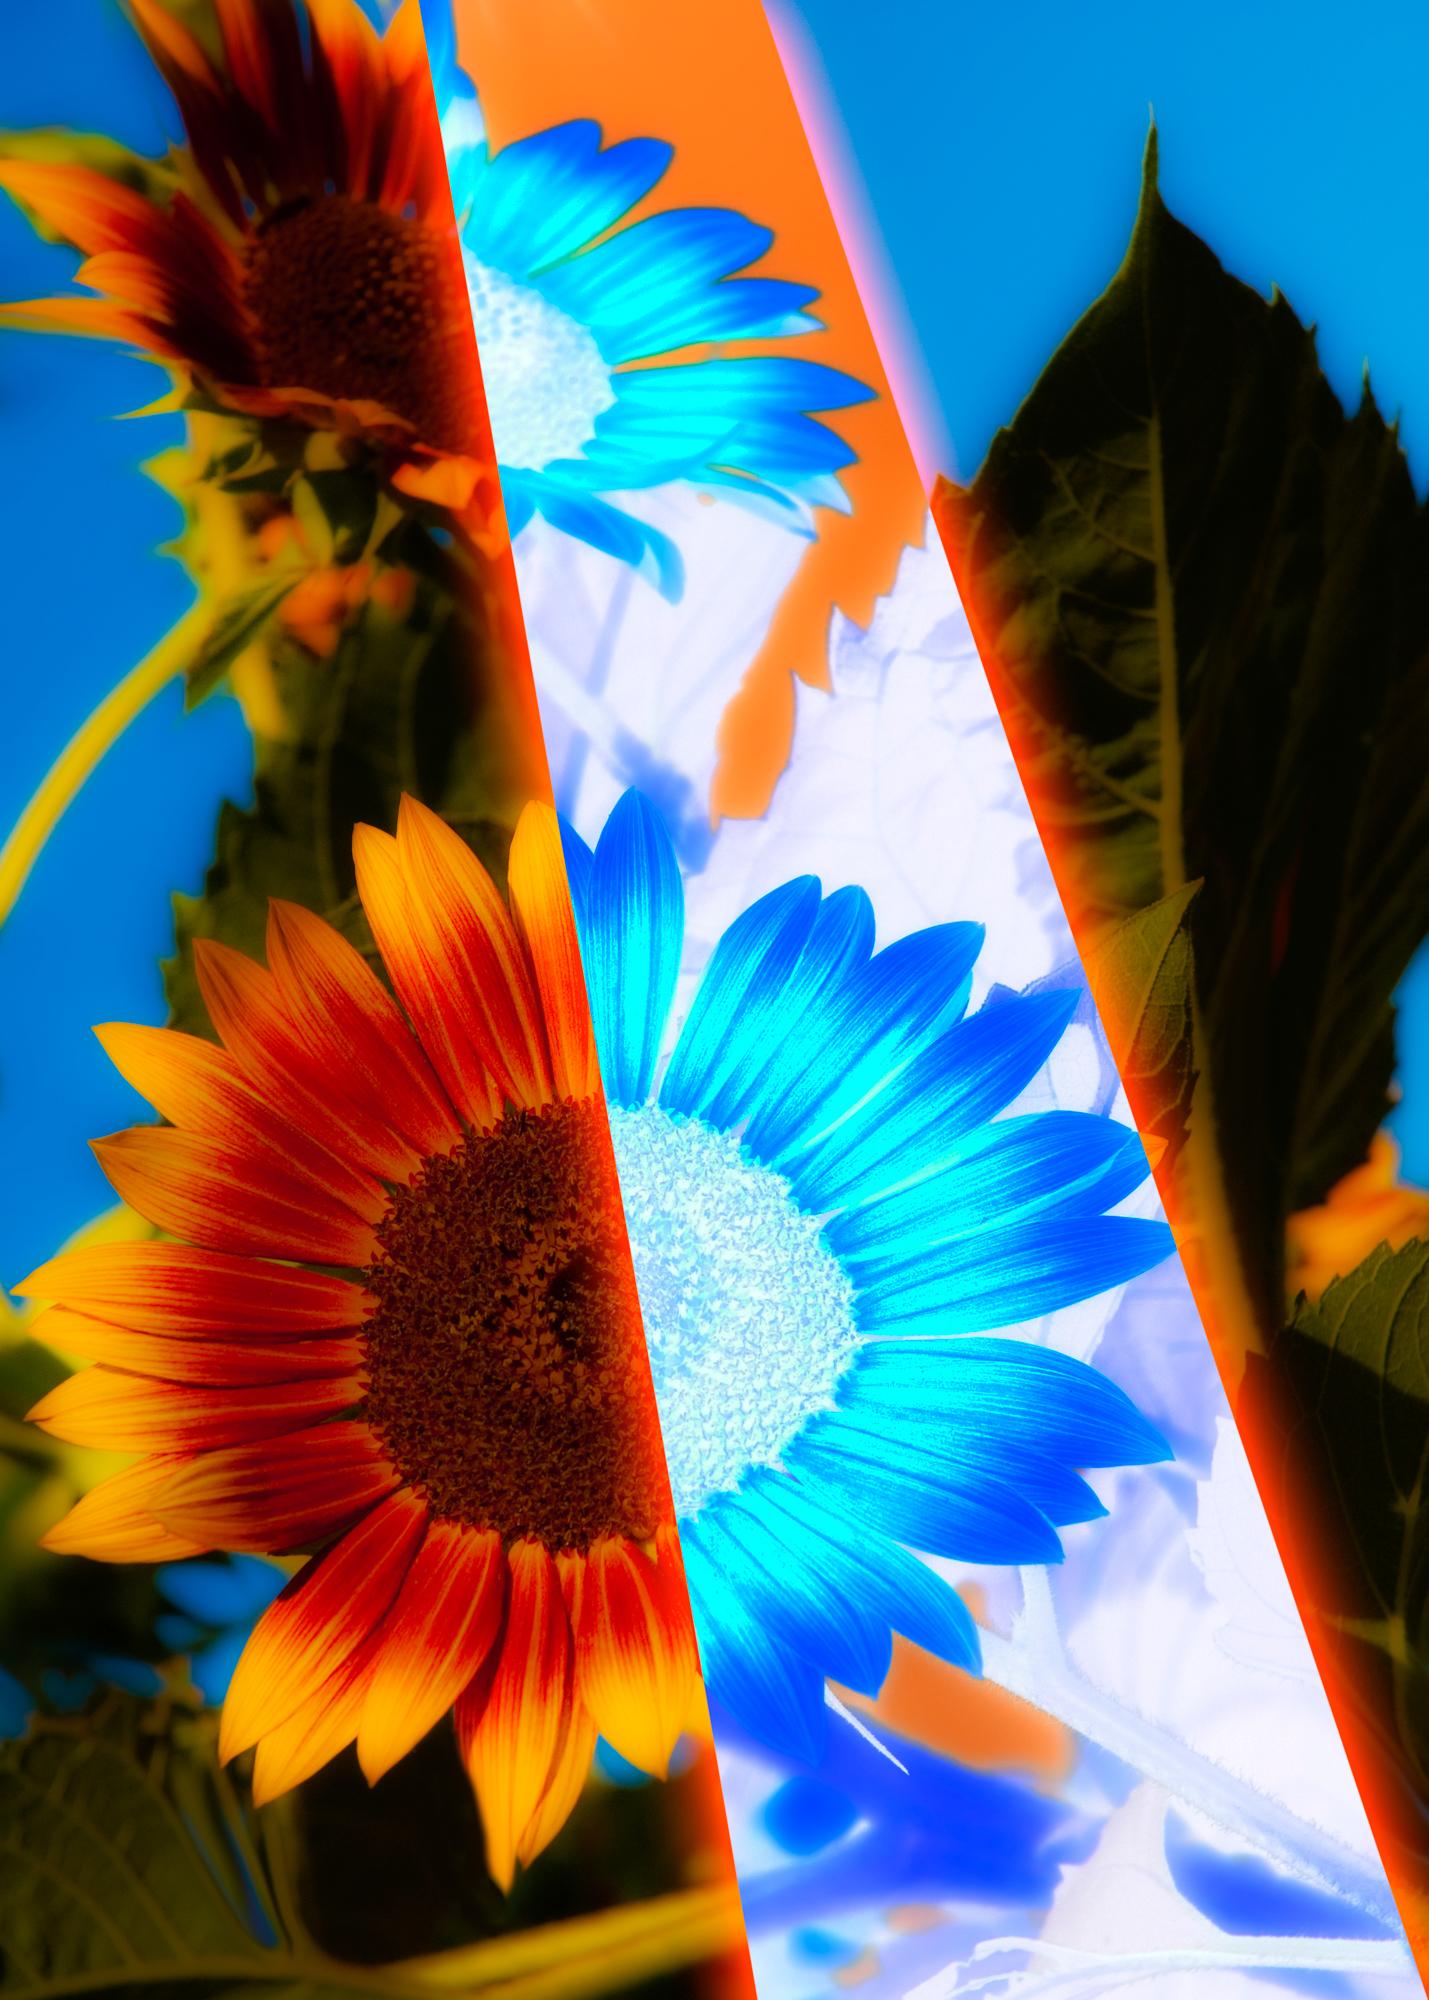 Sunny_Flower copy